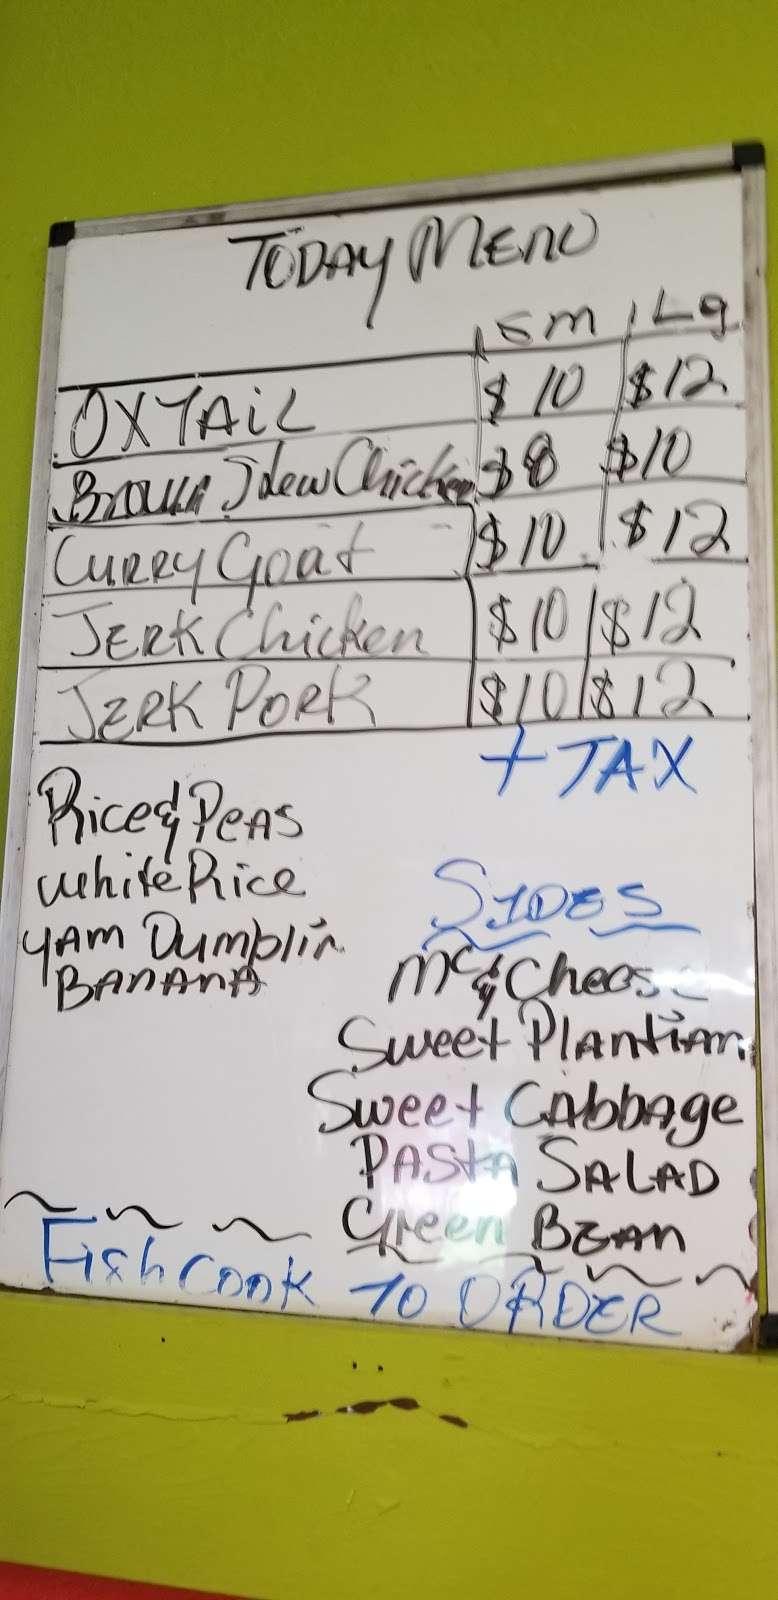 Flavors 27 restaurant &Bar - restaurant  | Photo 4 of 4 | Address: 510 US-27, South Bay, FL 33493, USA | Phone: (561) 708-8138